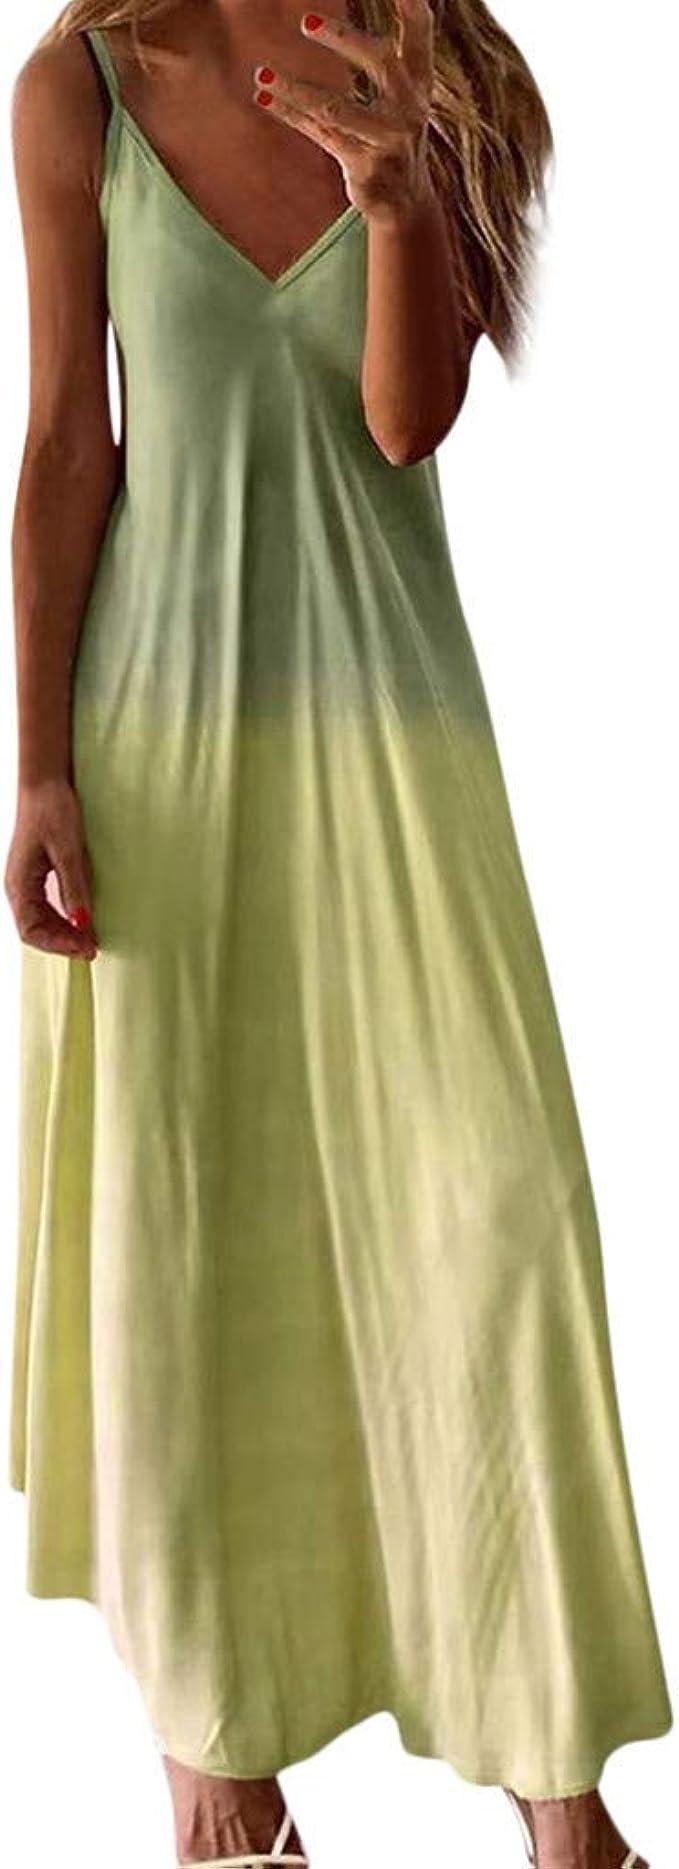 SHINEHUA Damen Sommerkleid Ärmellos Strandkleid Boho Maxikleid